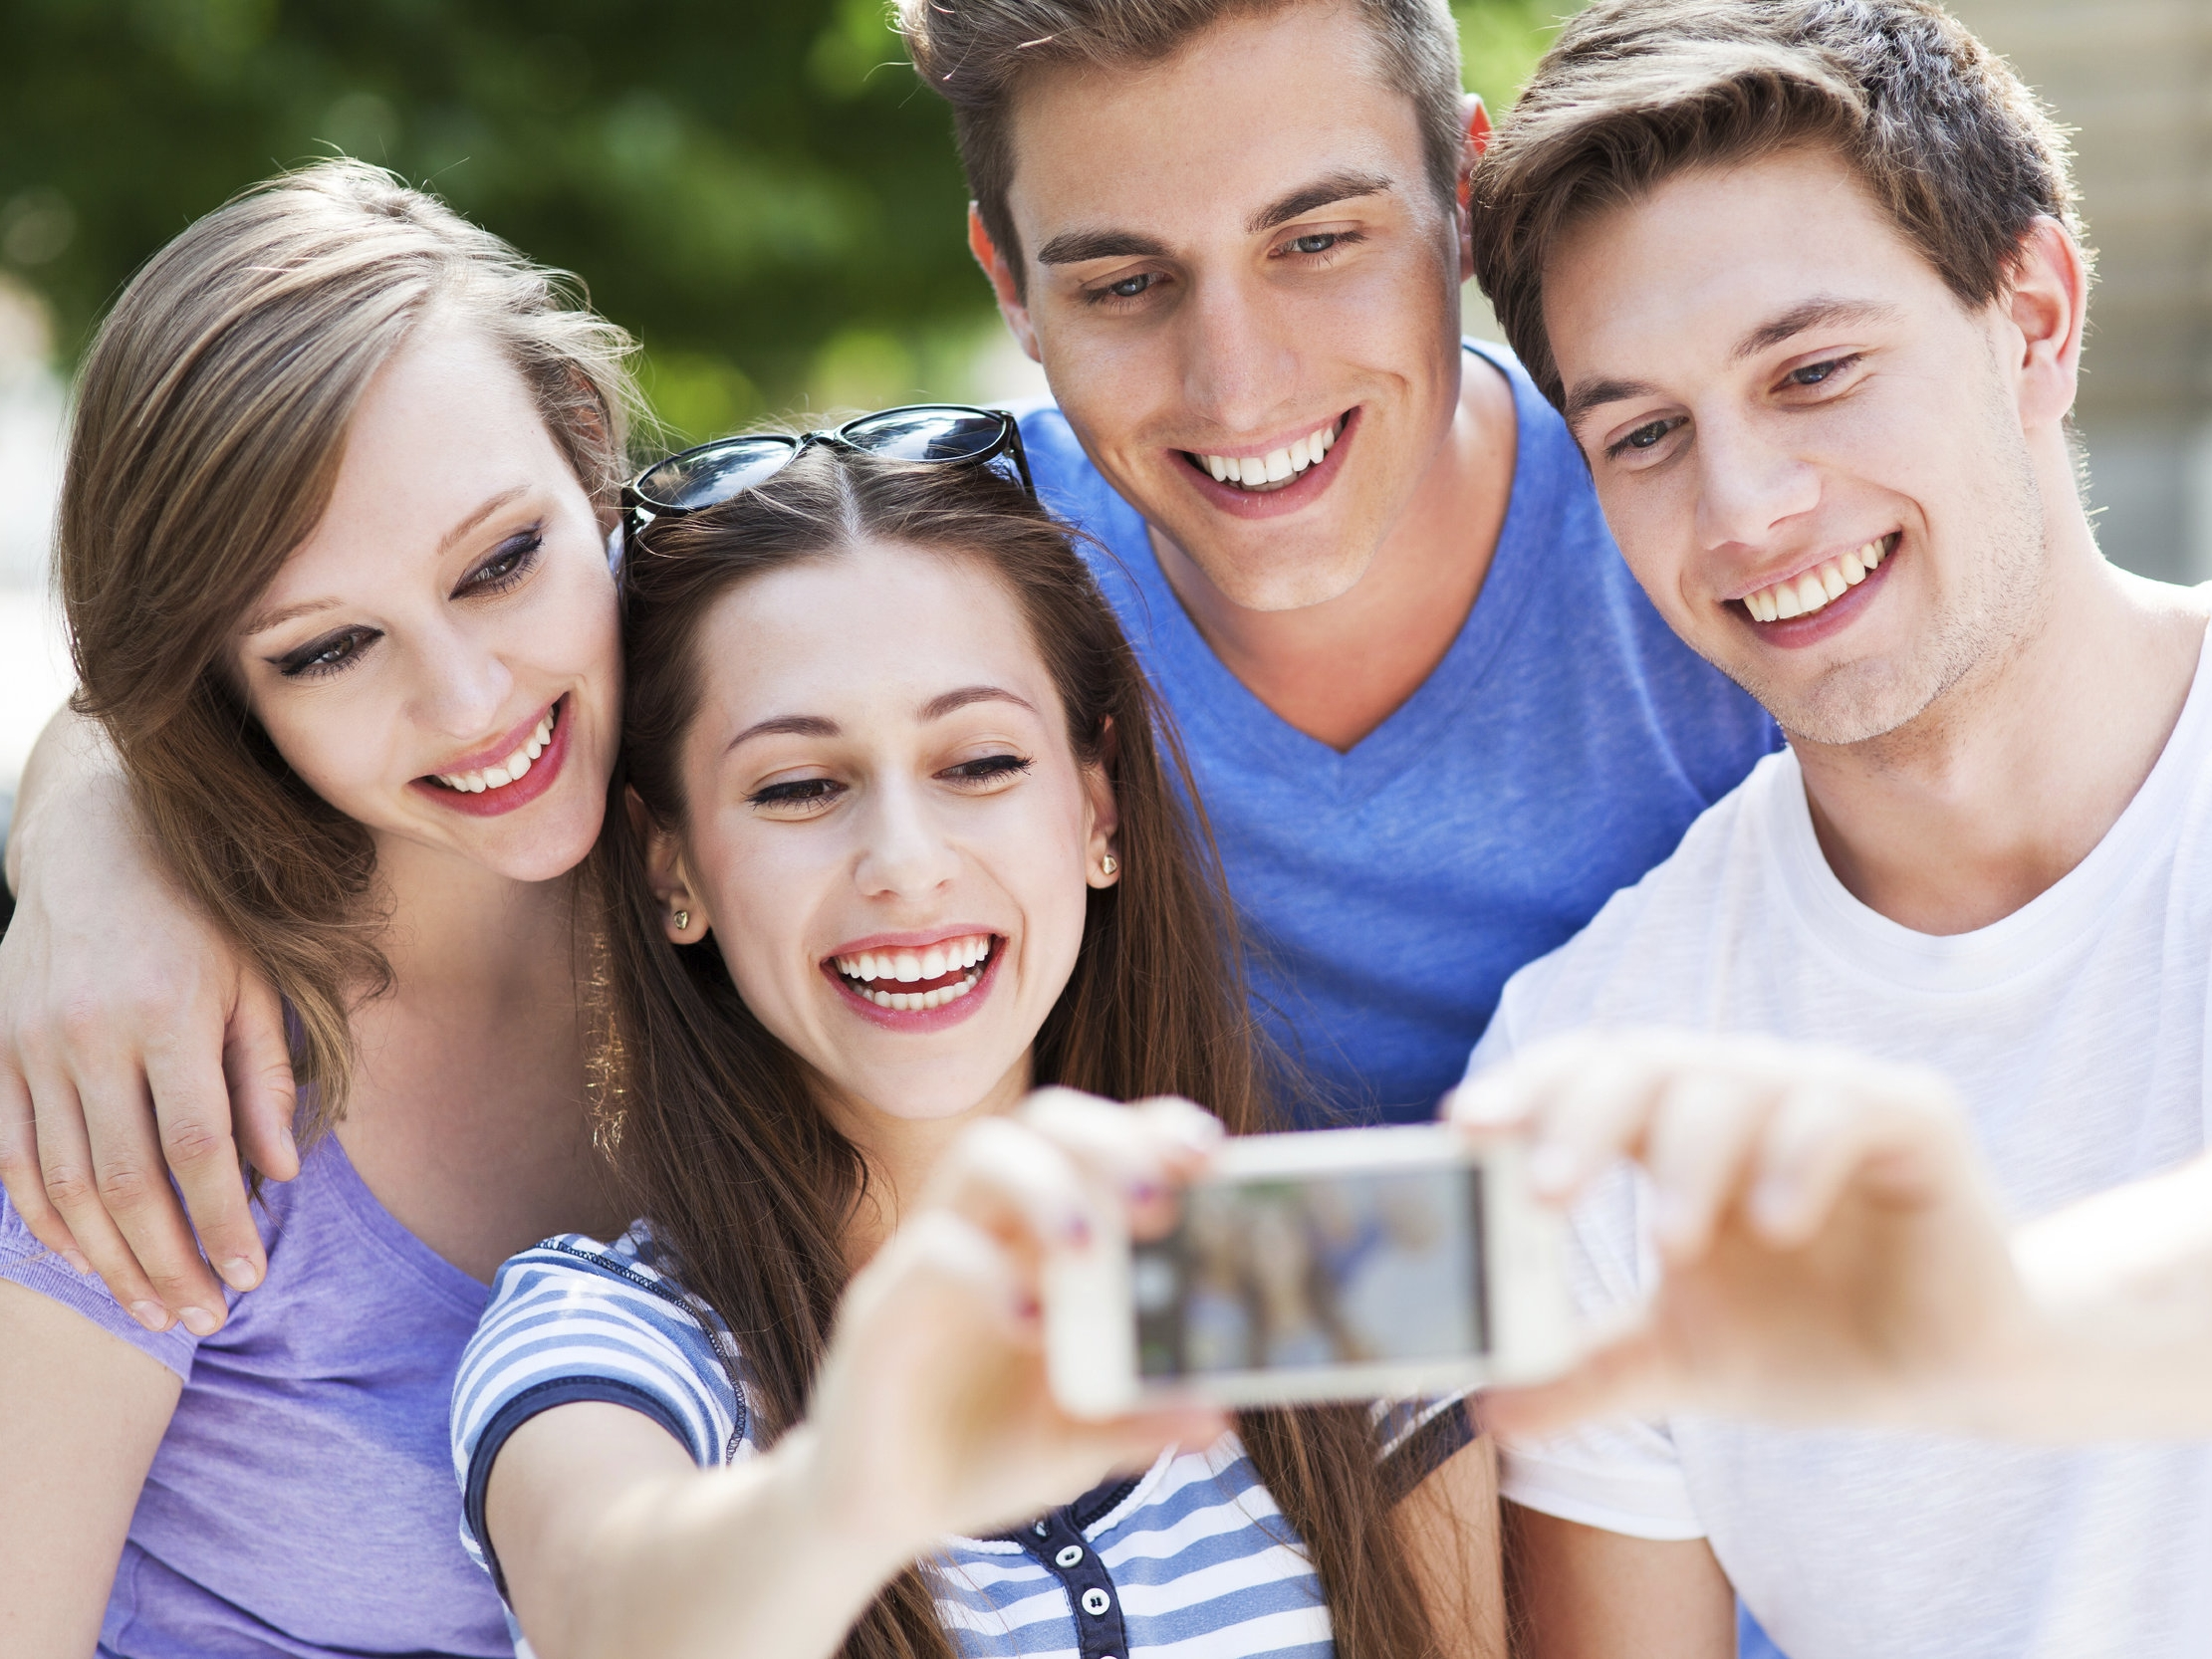 Straighter teeth can help resist gum disease and future dental problems.